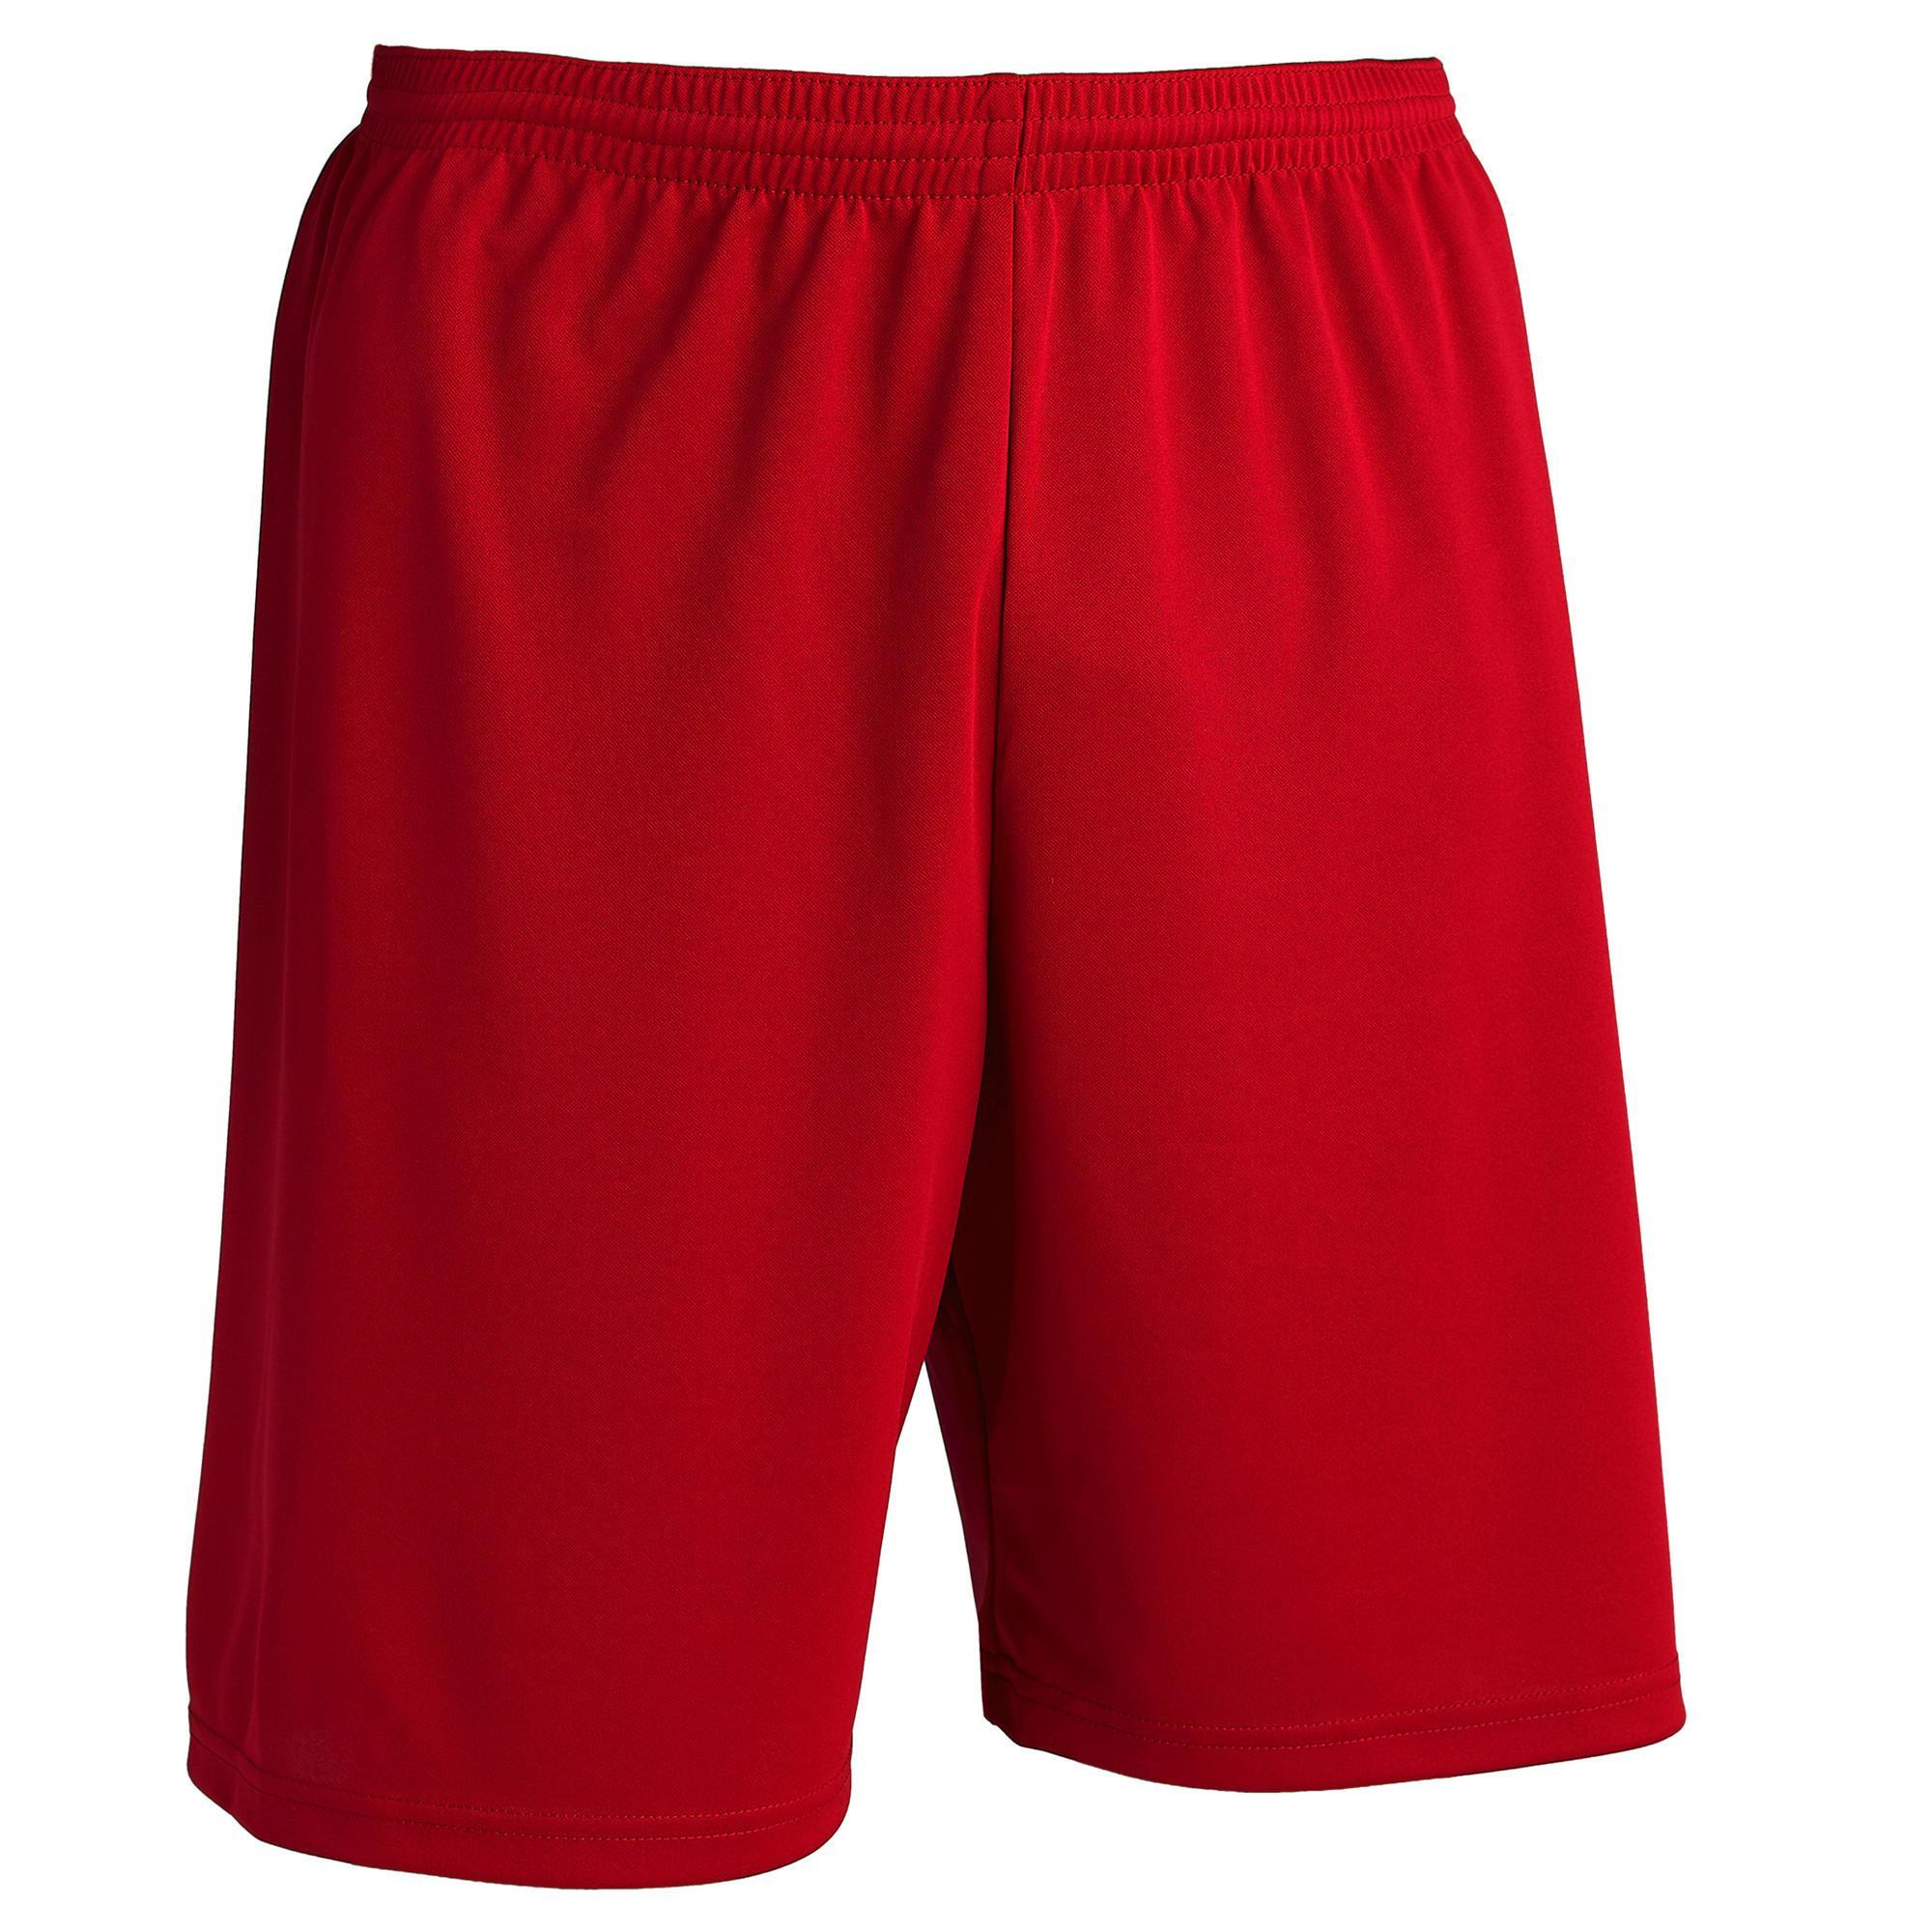 Kipsta Voetbalbroekje F100 rood